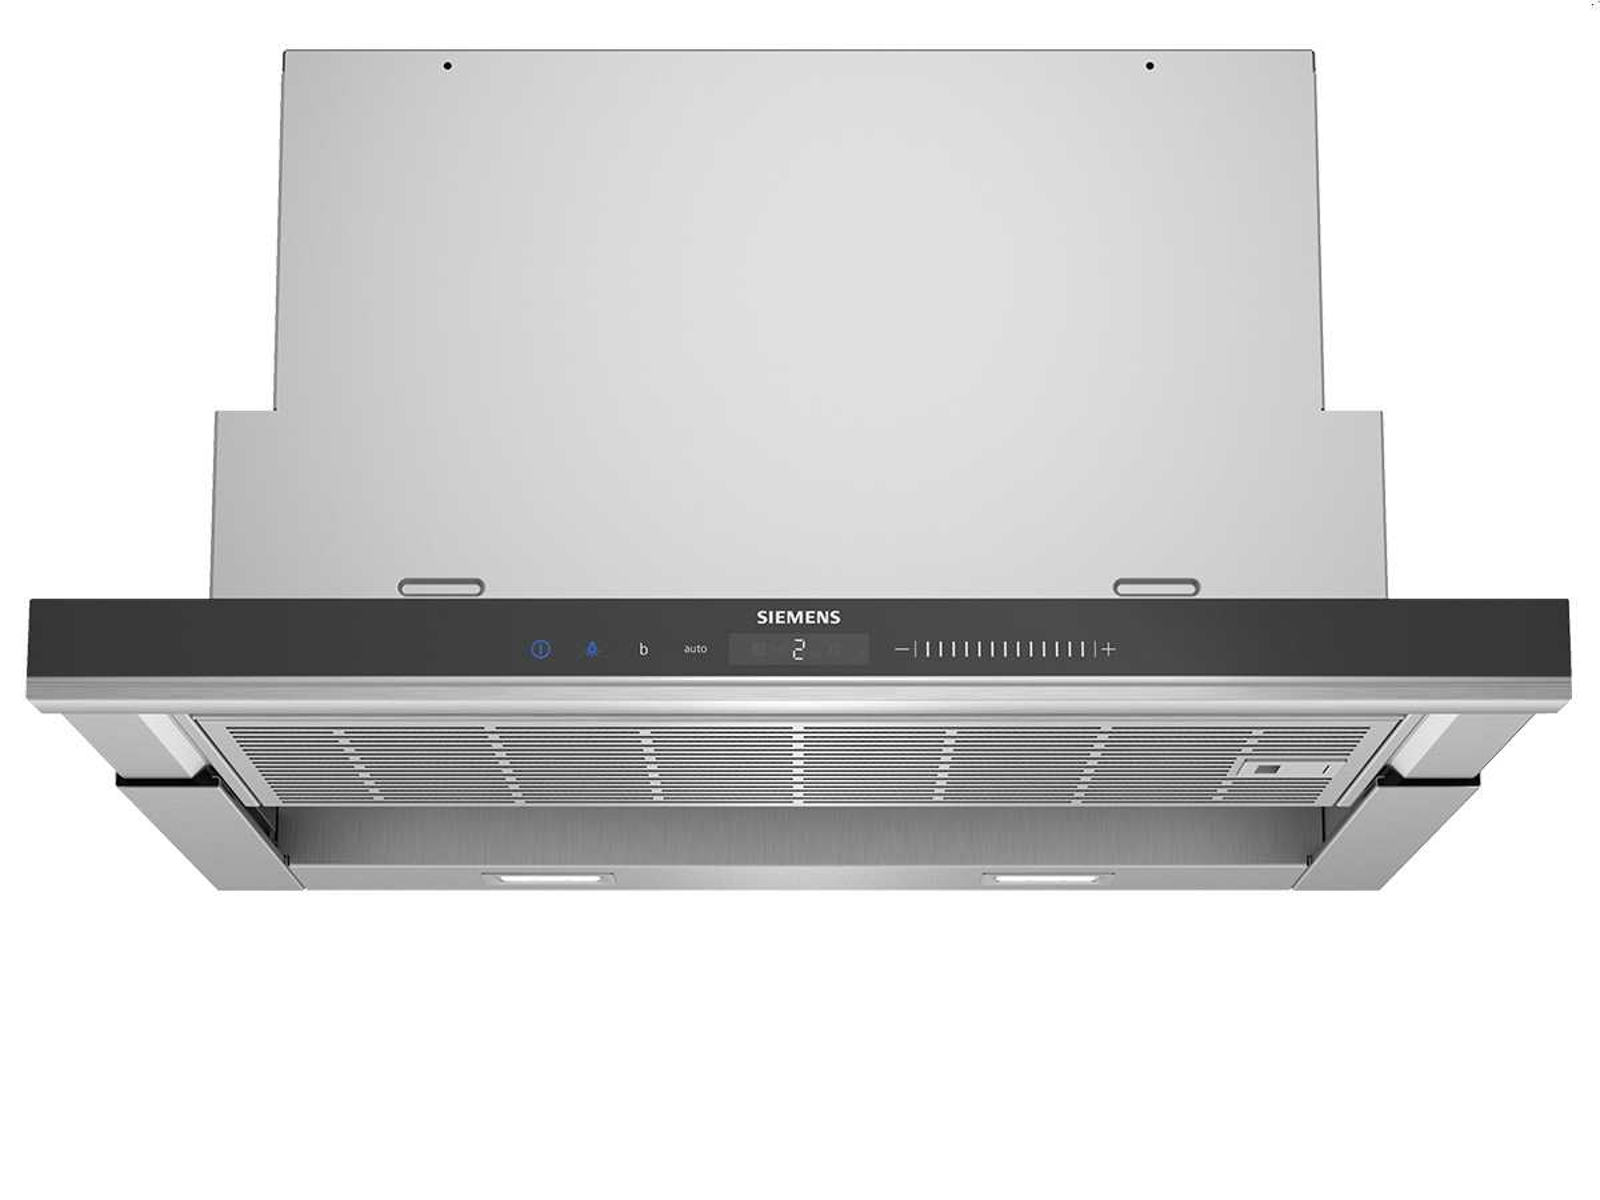 Siemens li69sa683 flachschirmhaube schwarz